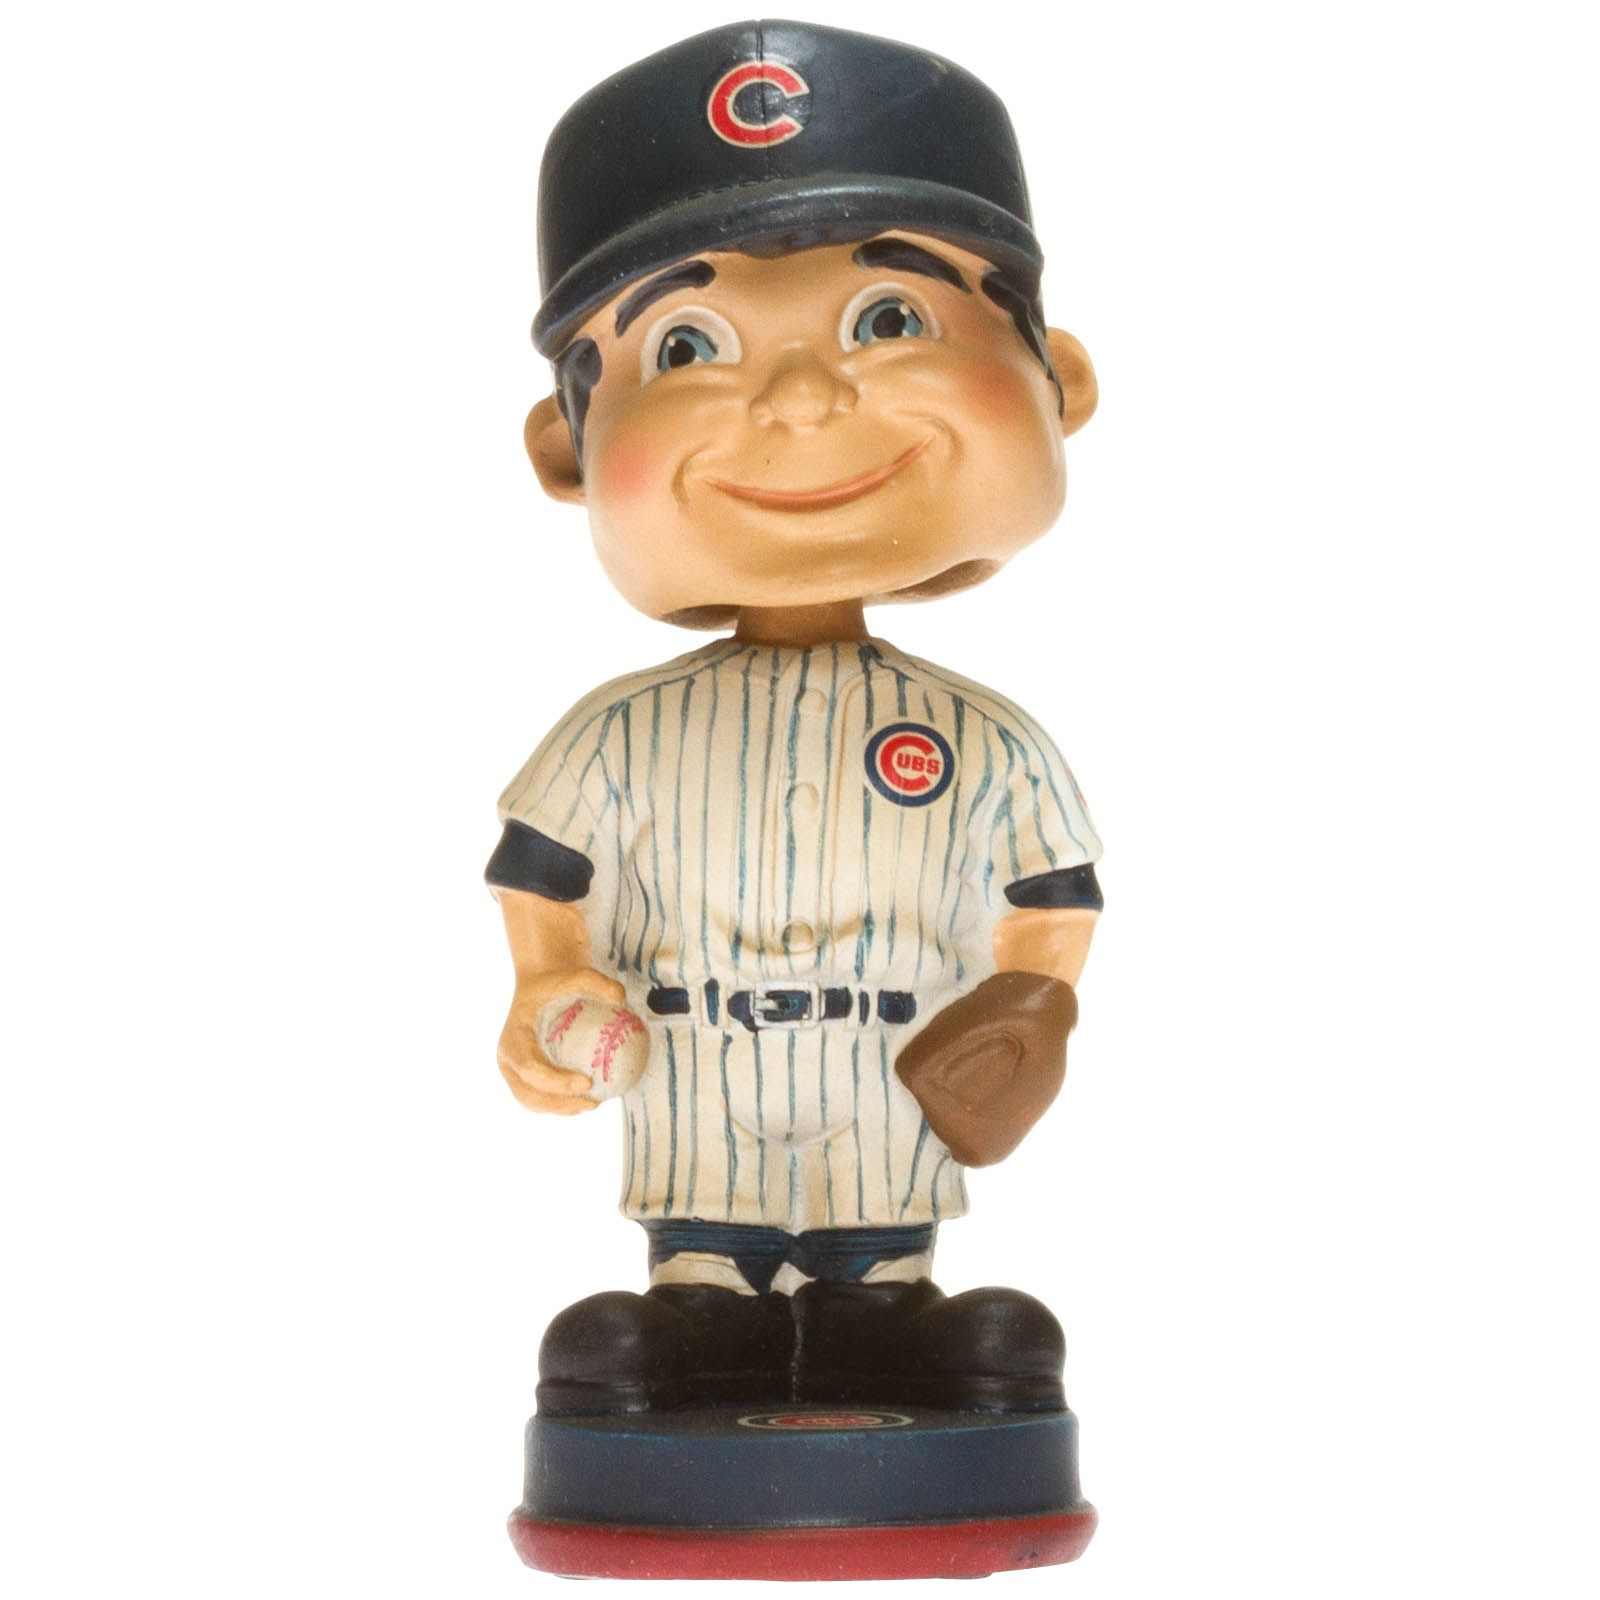 Chicago Cubs Vintage Pinstripe Uniform Bobble Head by